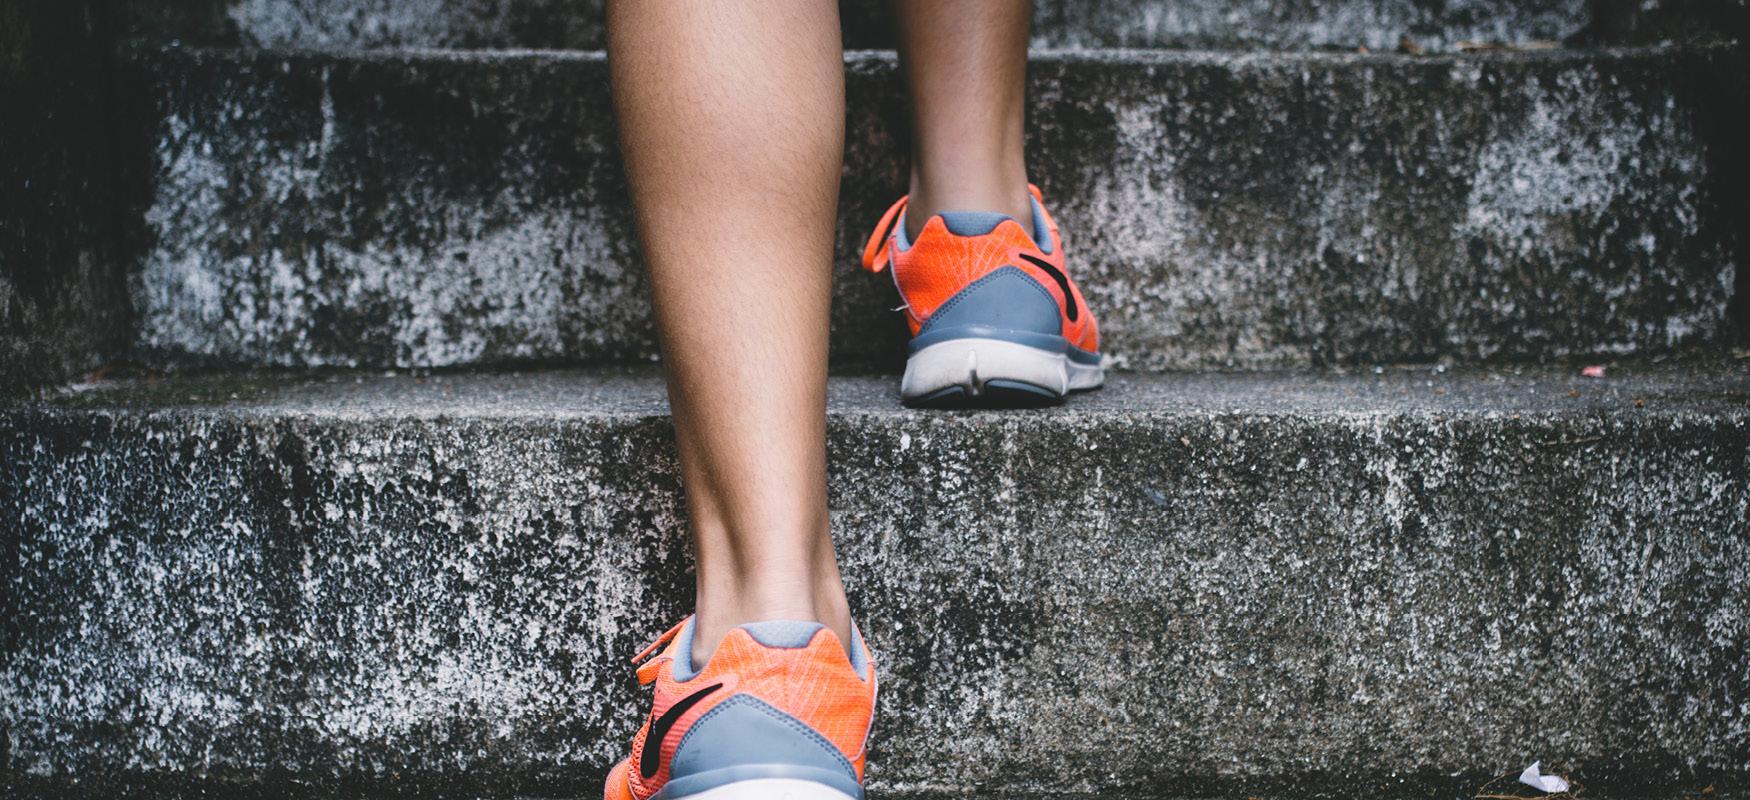 kellys charity run, guildford, sports, fitness, running, marathon,